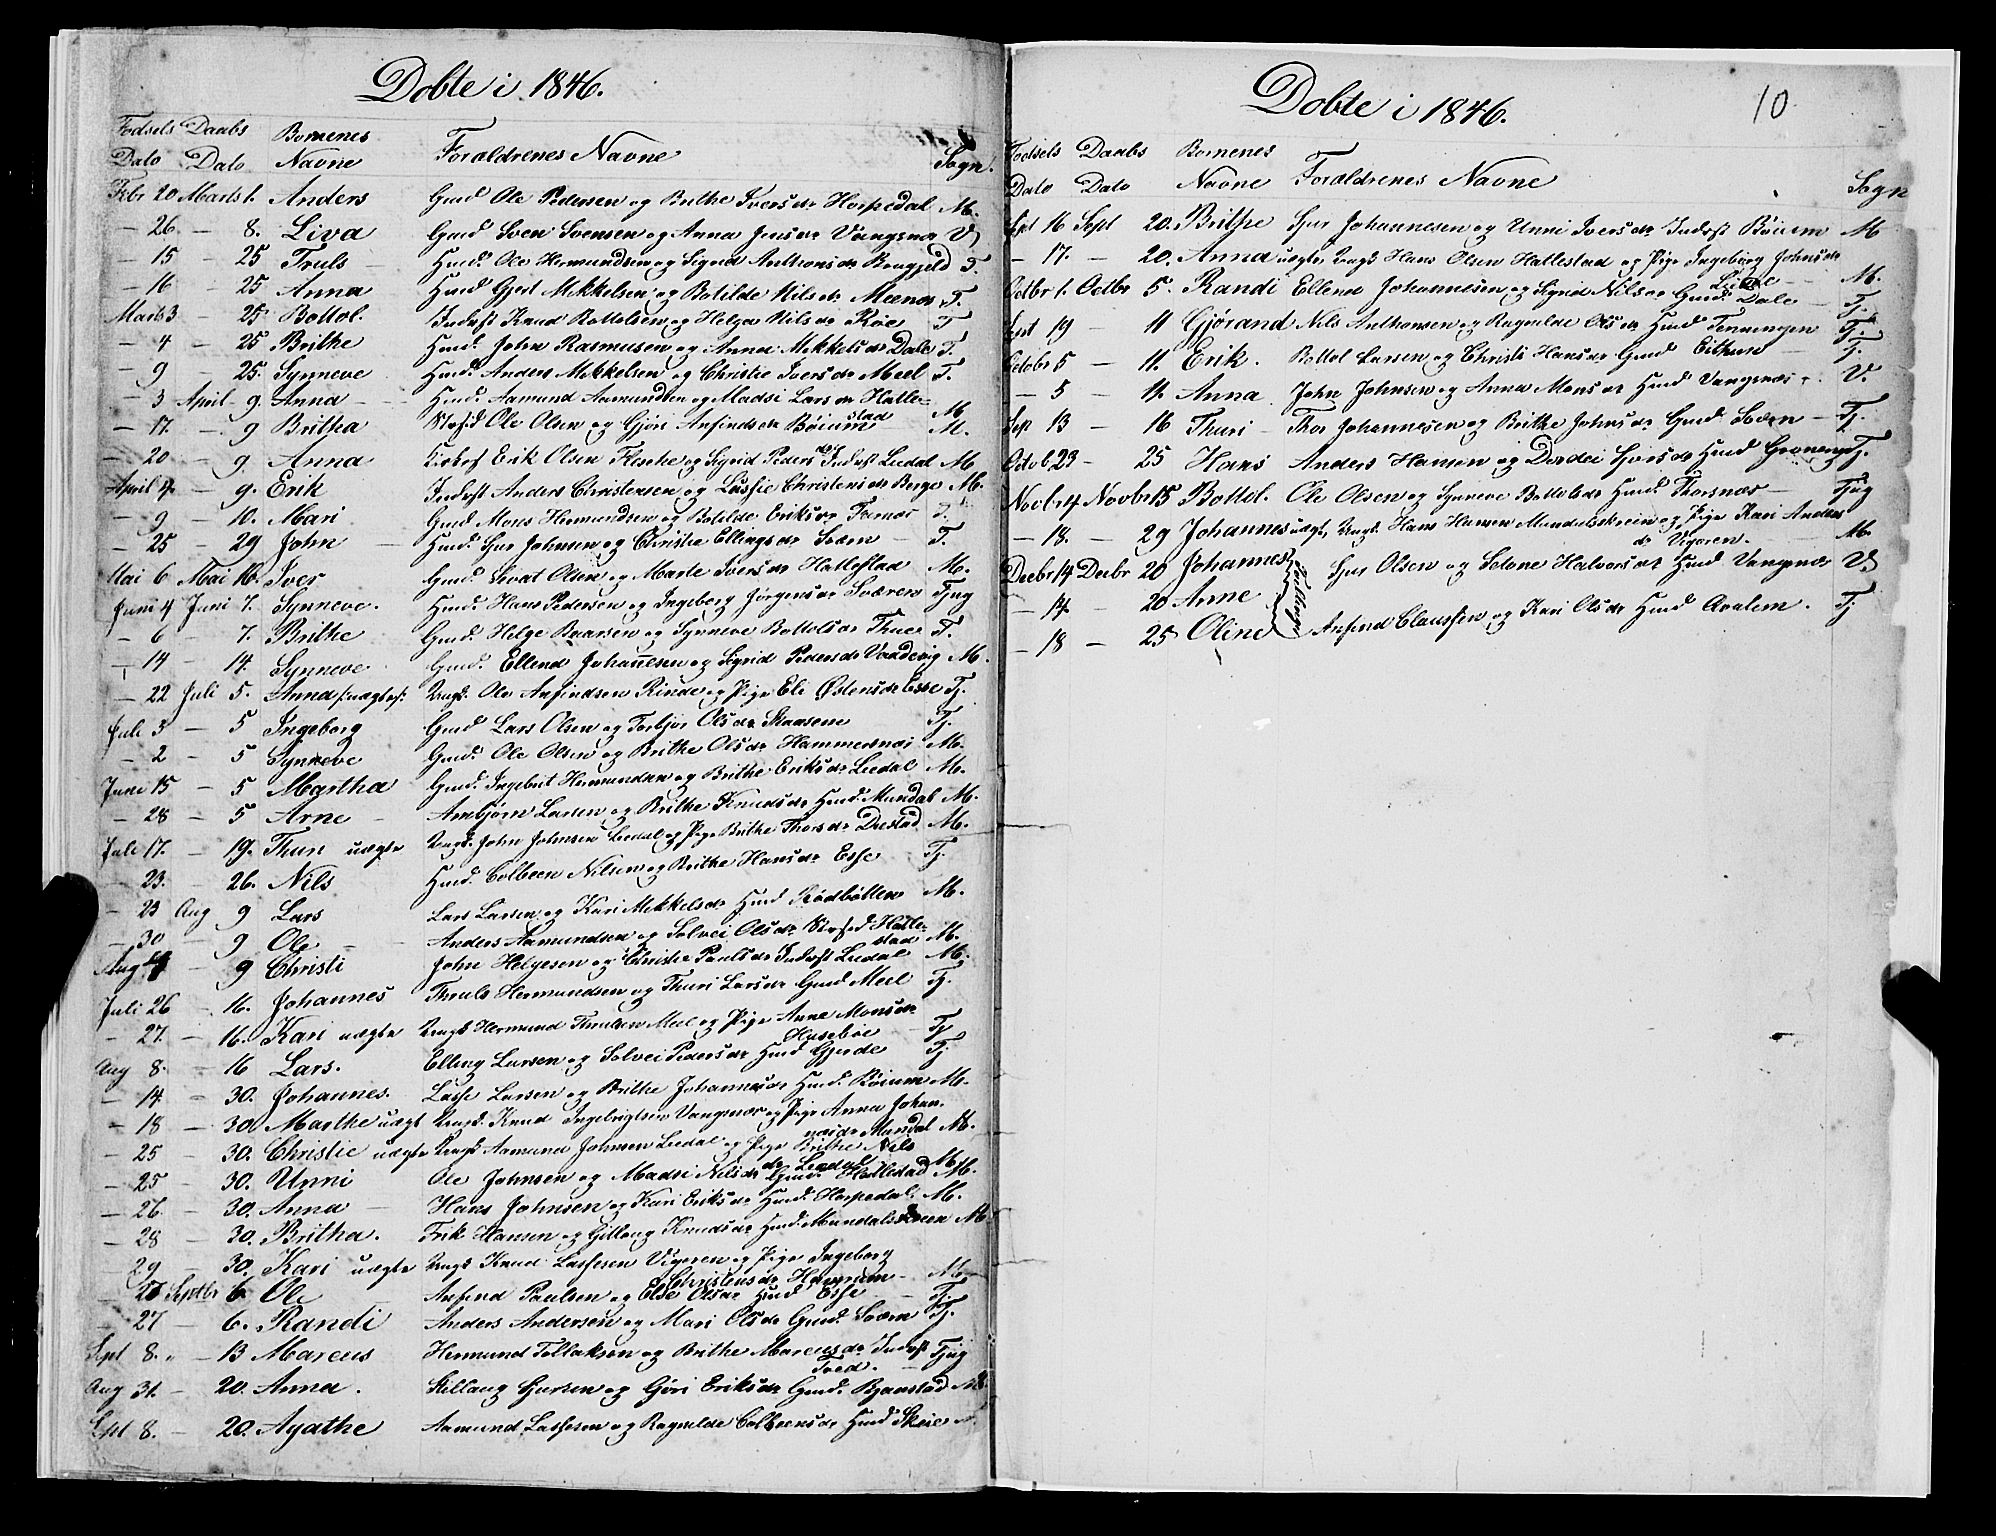 SAB, Leikanger Sokneprestembete, Ministerialbok nr. A 1, 1834-1846, s. 10